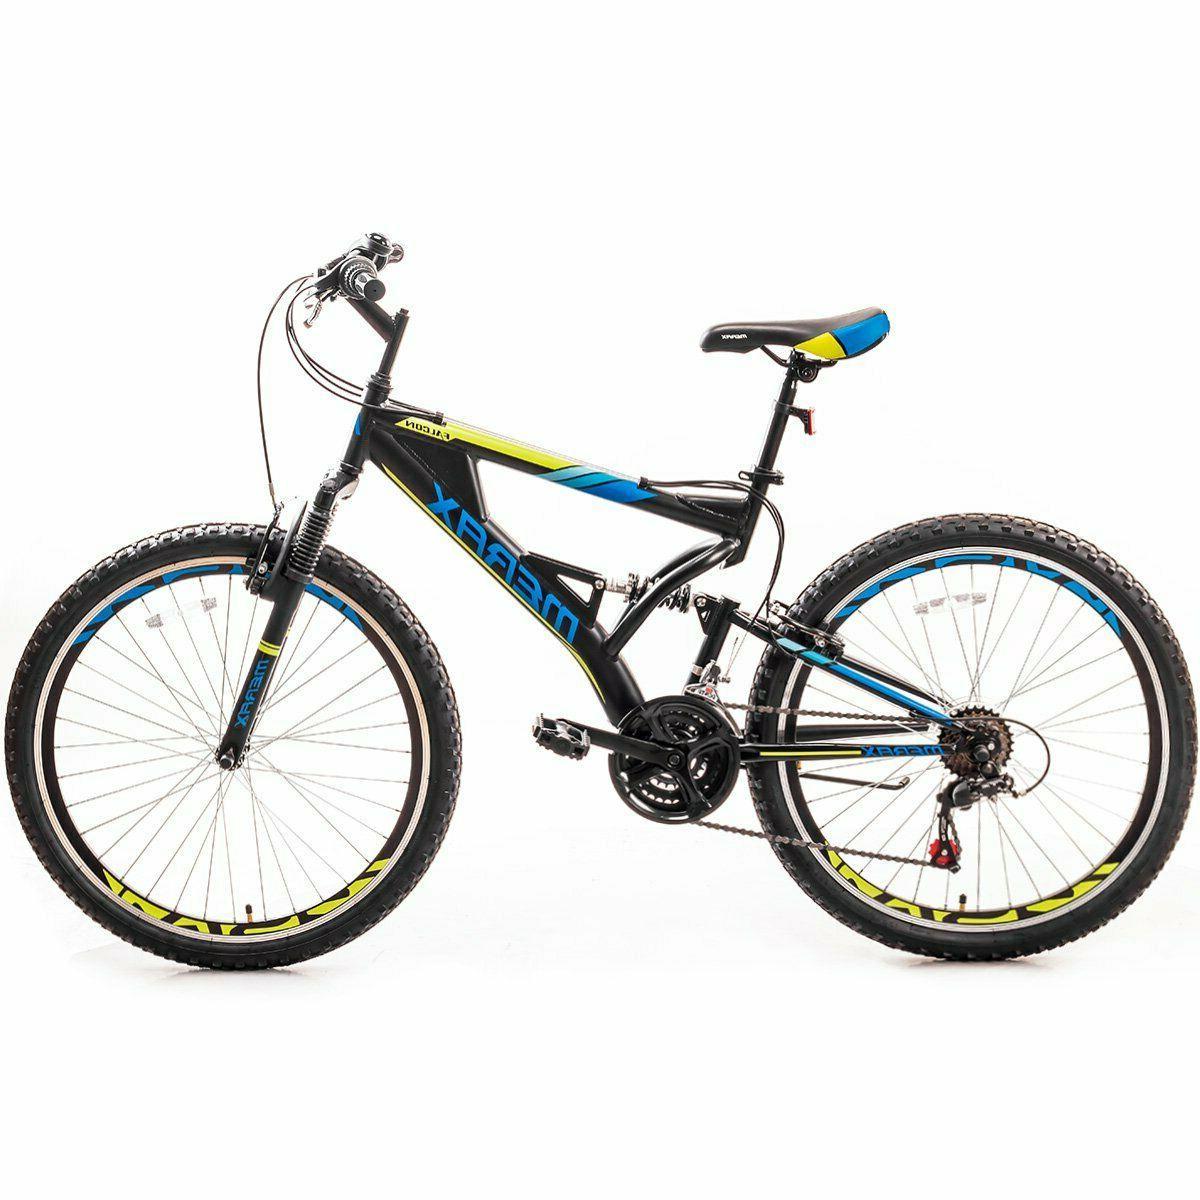 Full Aluminum Frame Bicycle